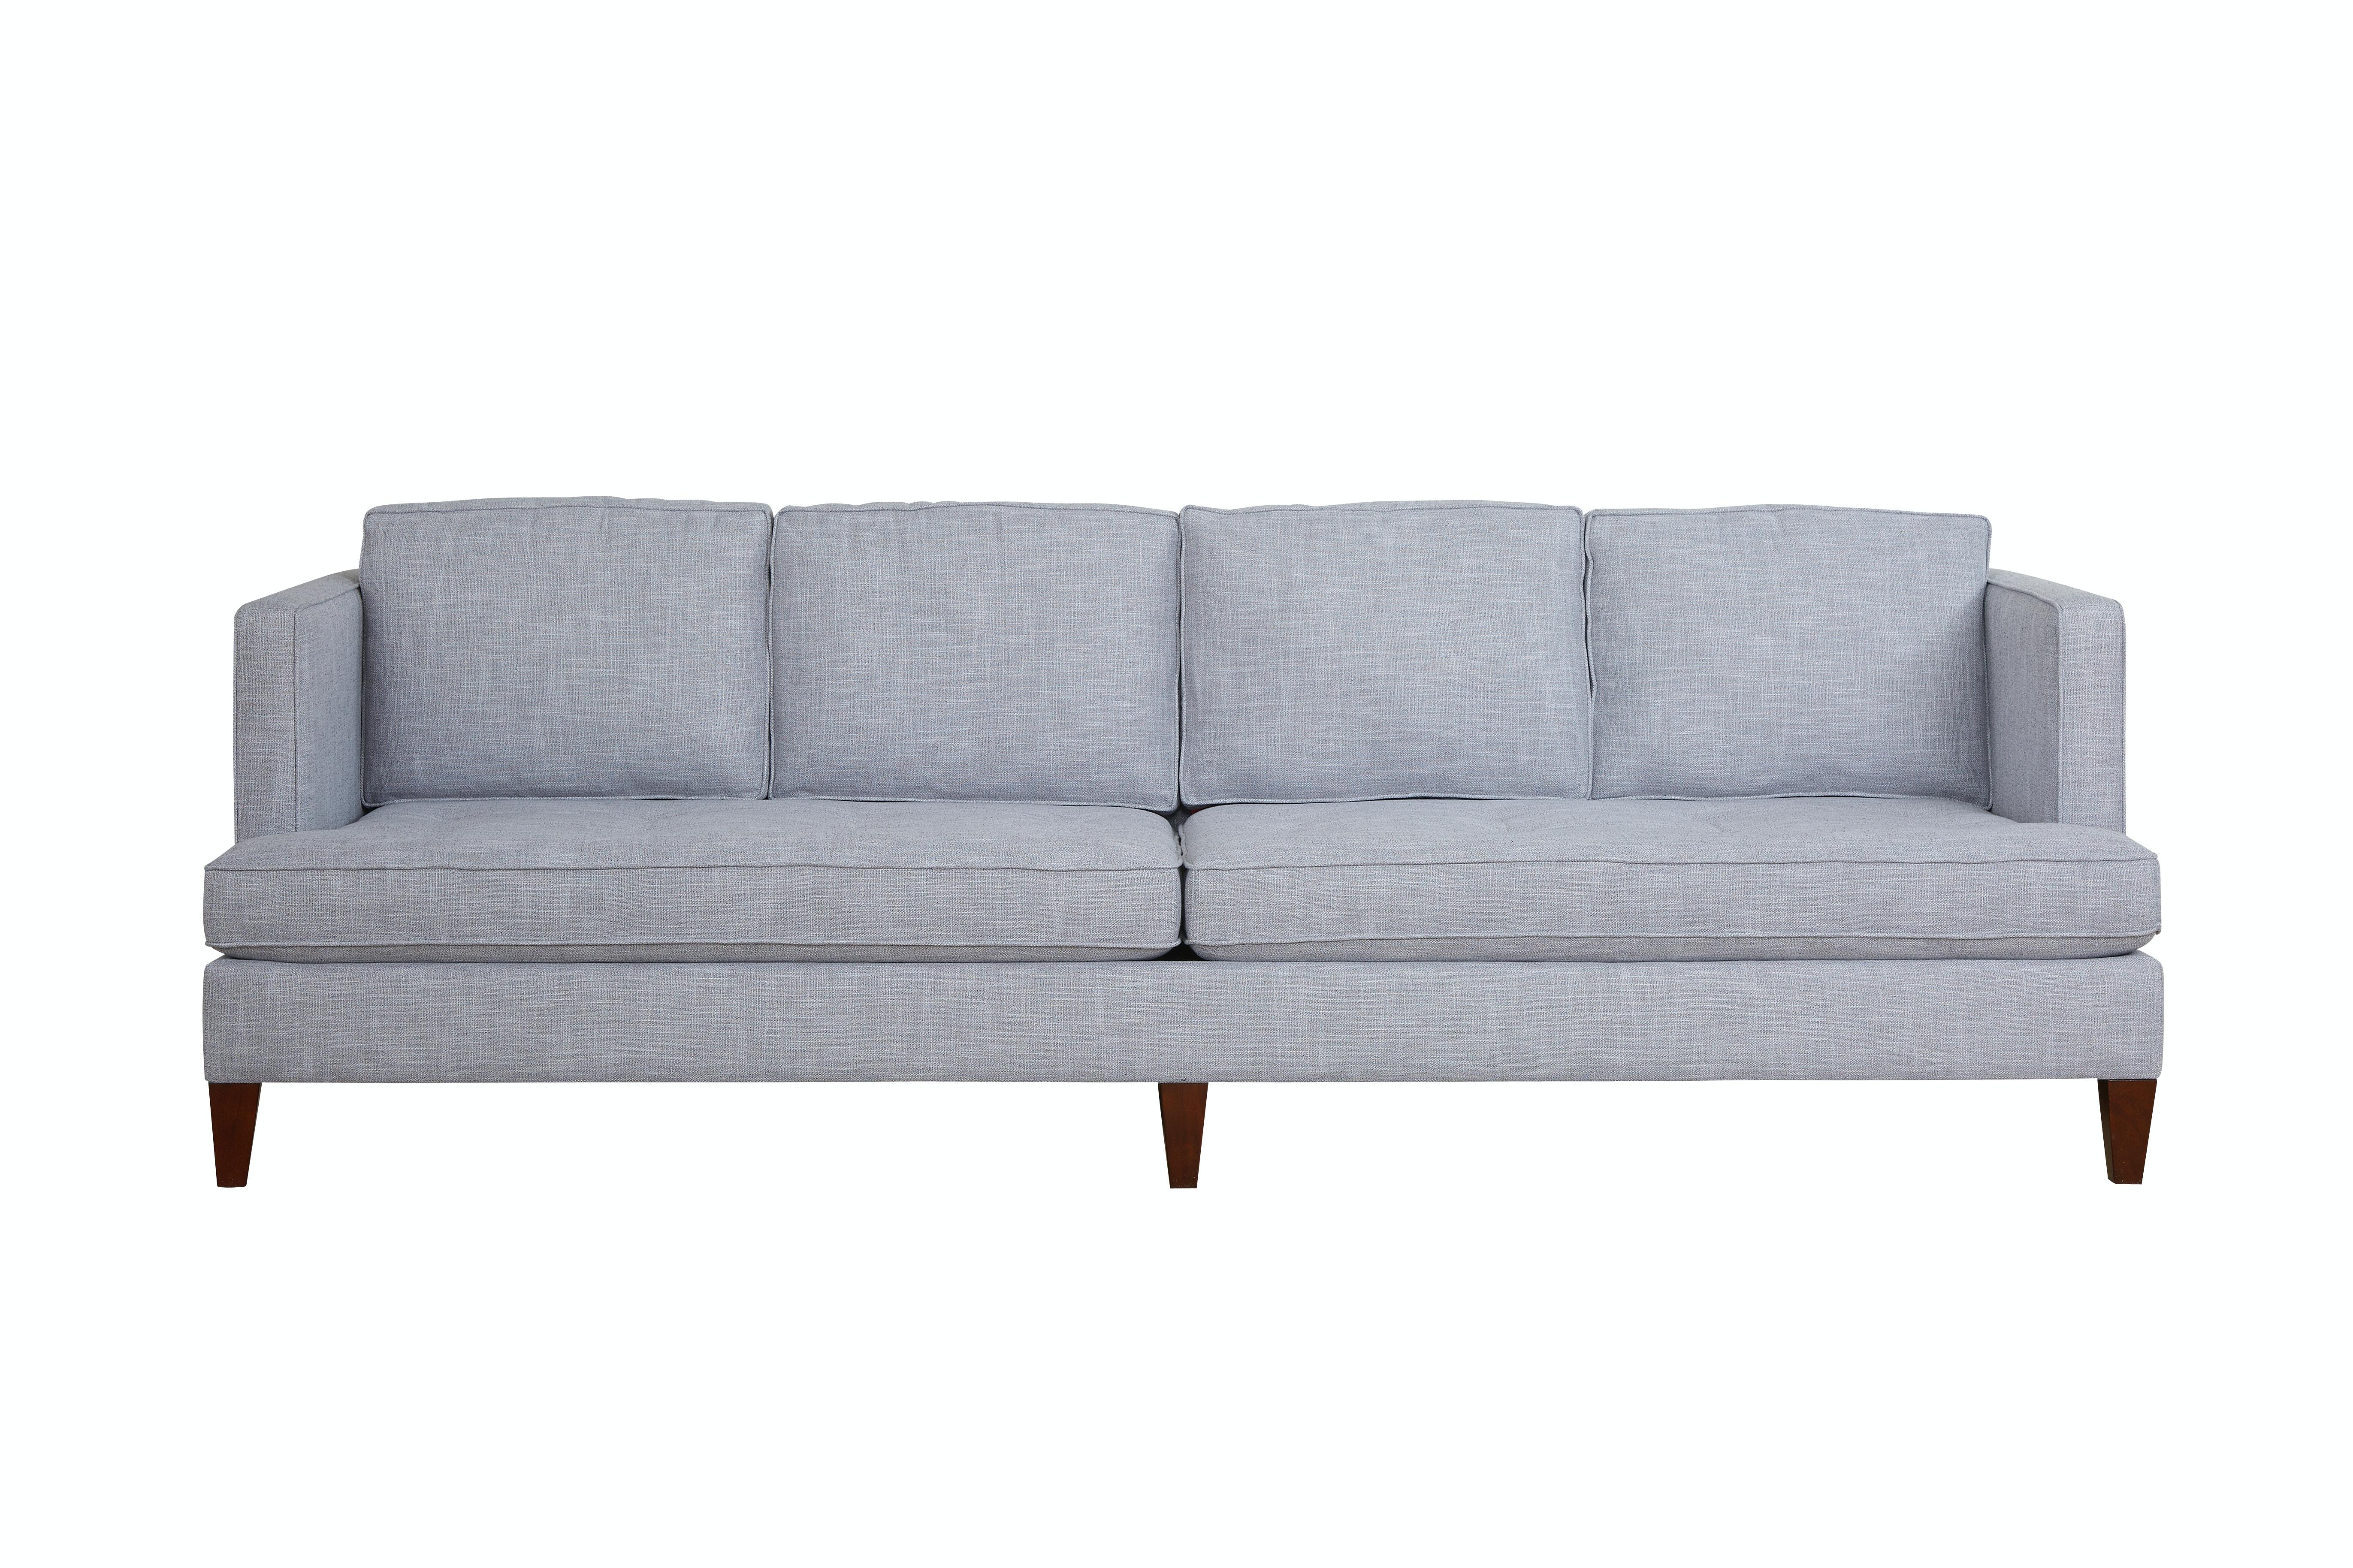 JOAN 4 SEAT SOFA